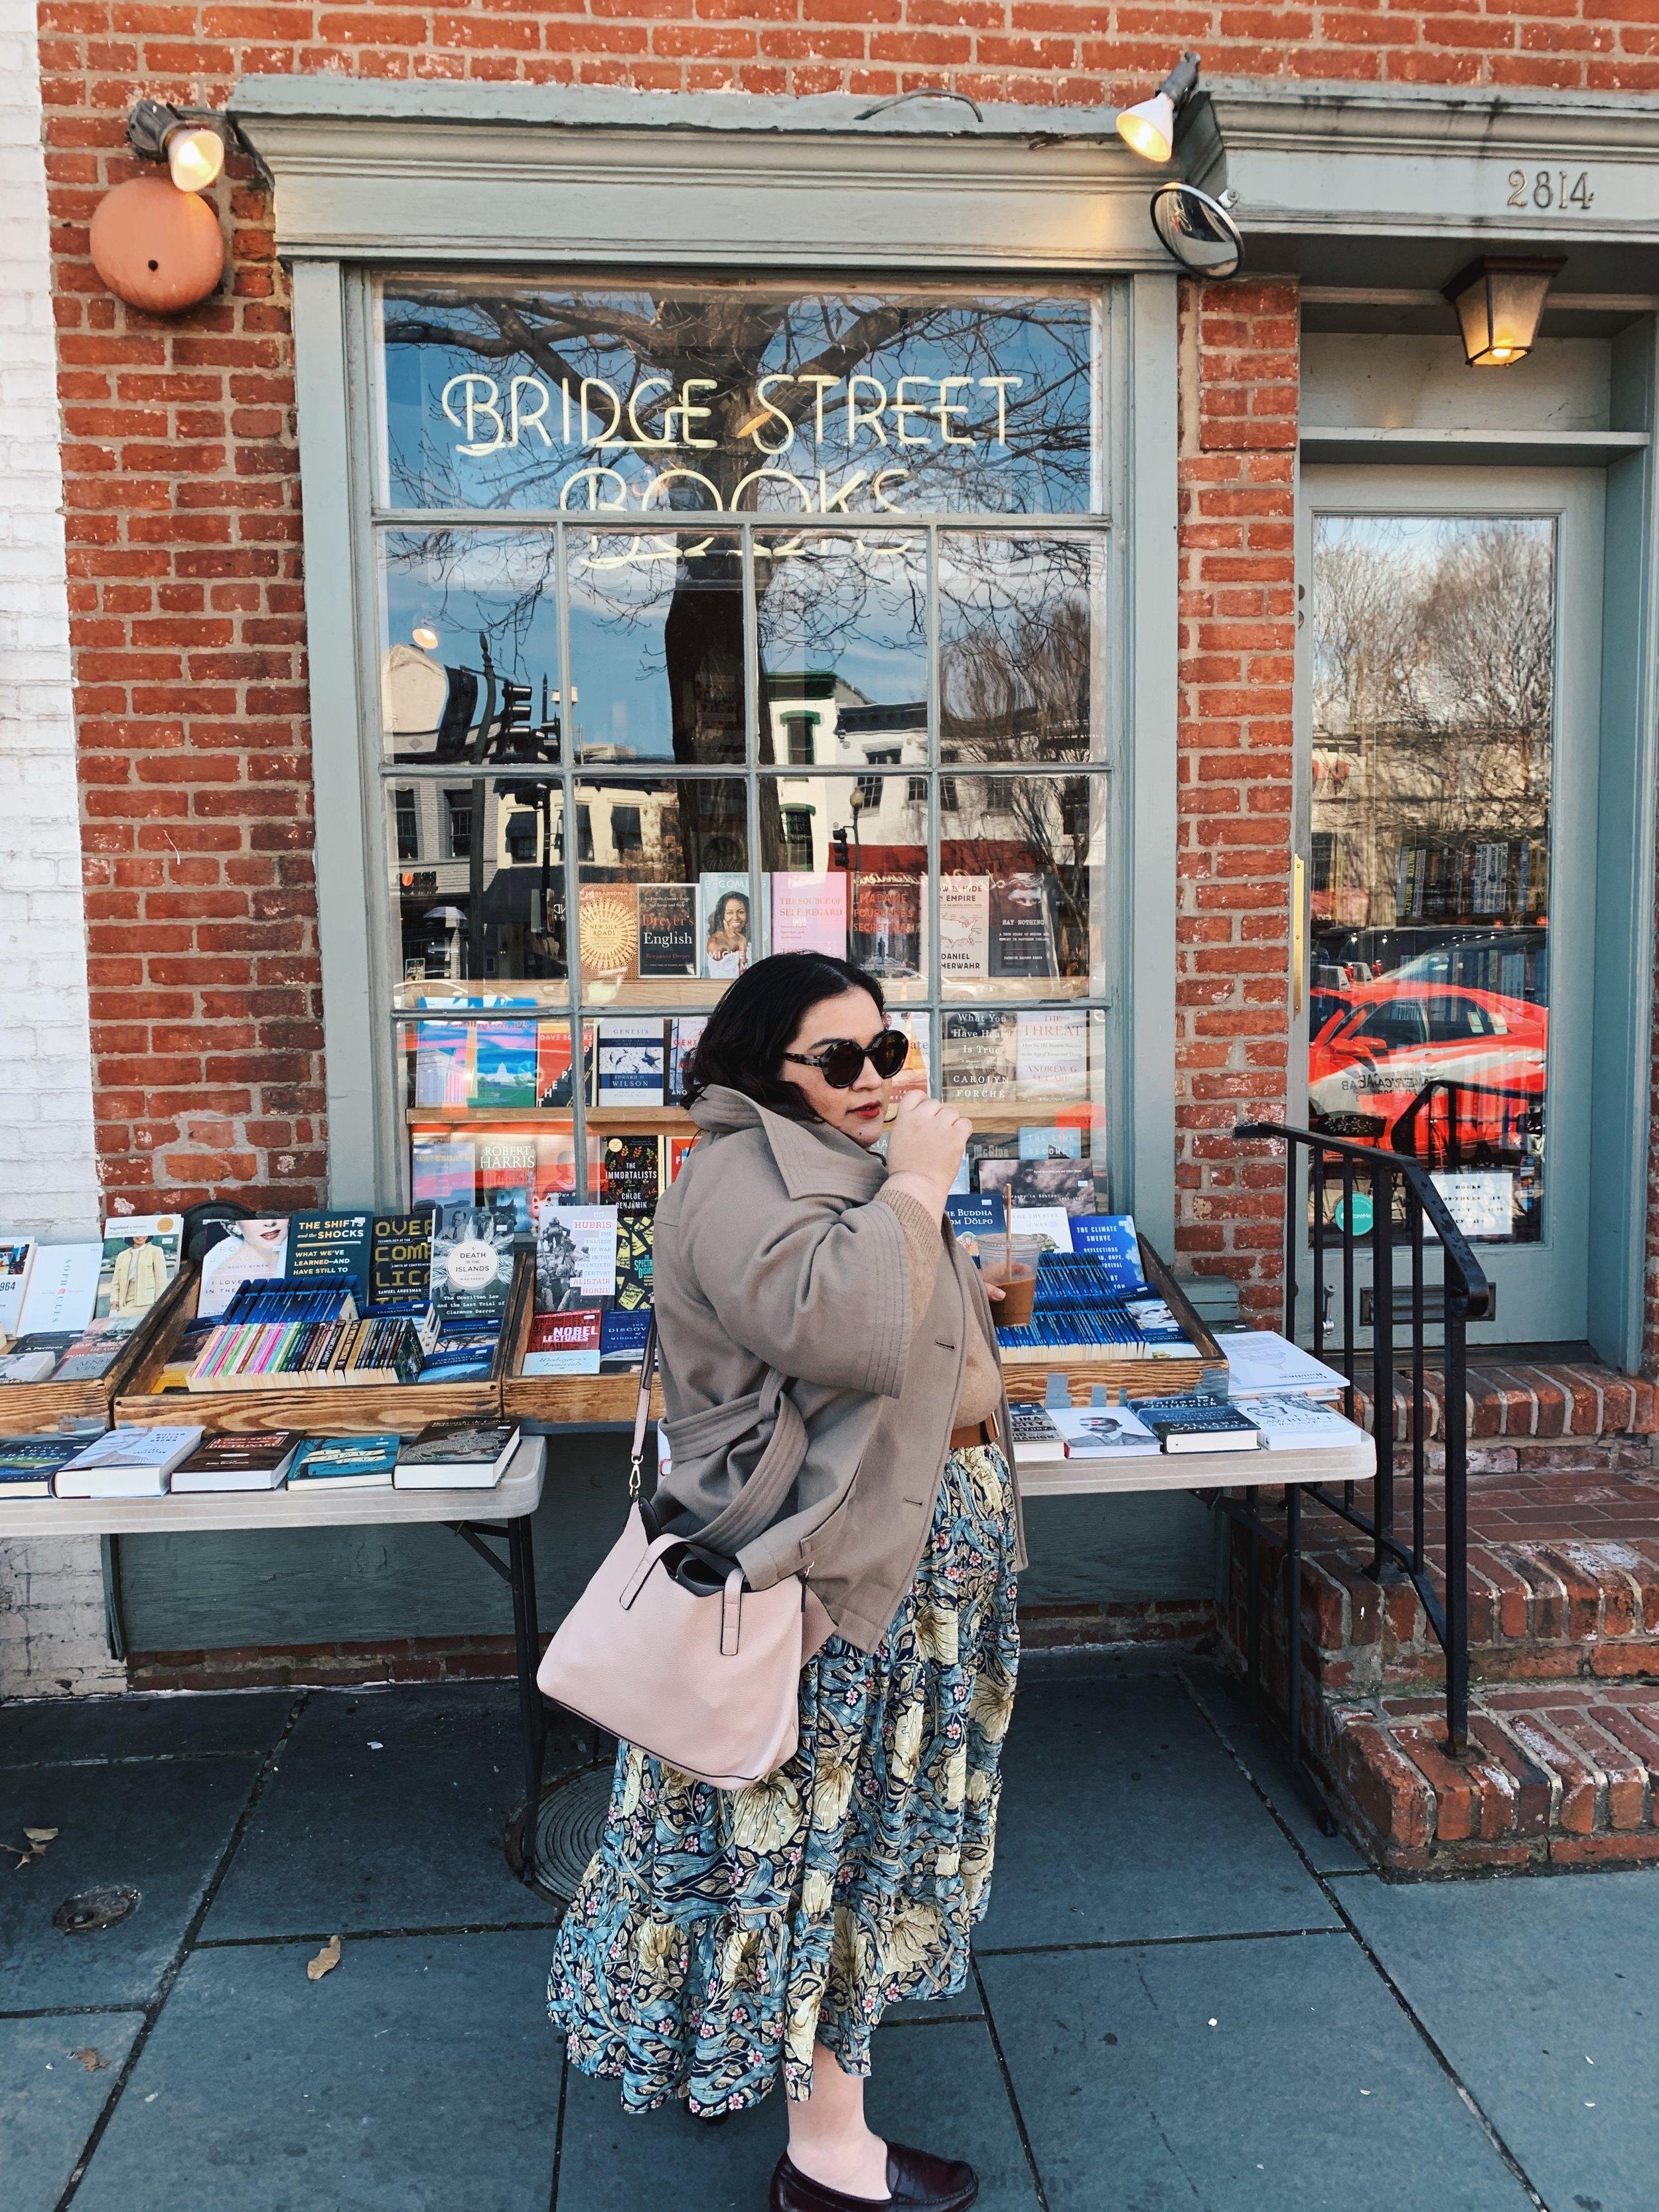 Bridge Street Books Georgetown The Attic on Eighth 1.JPG